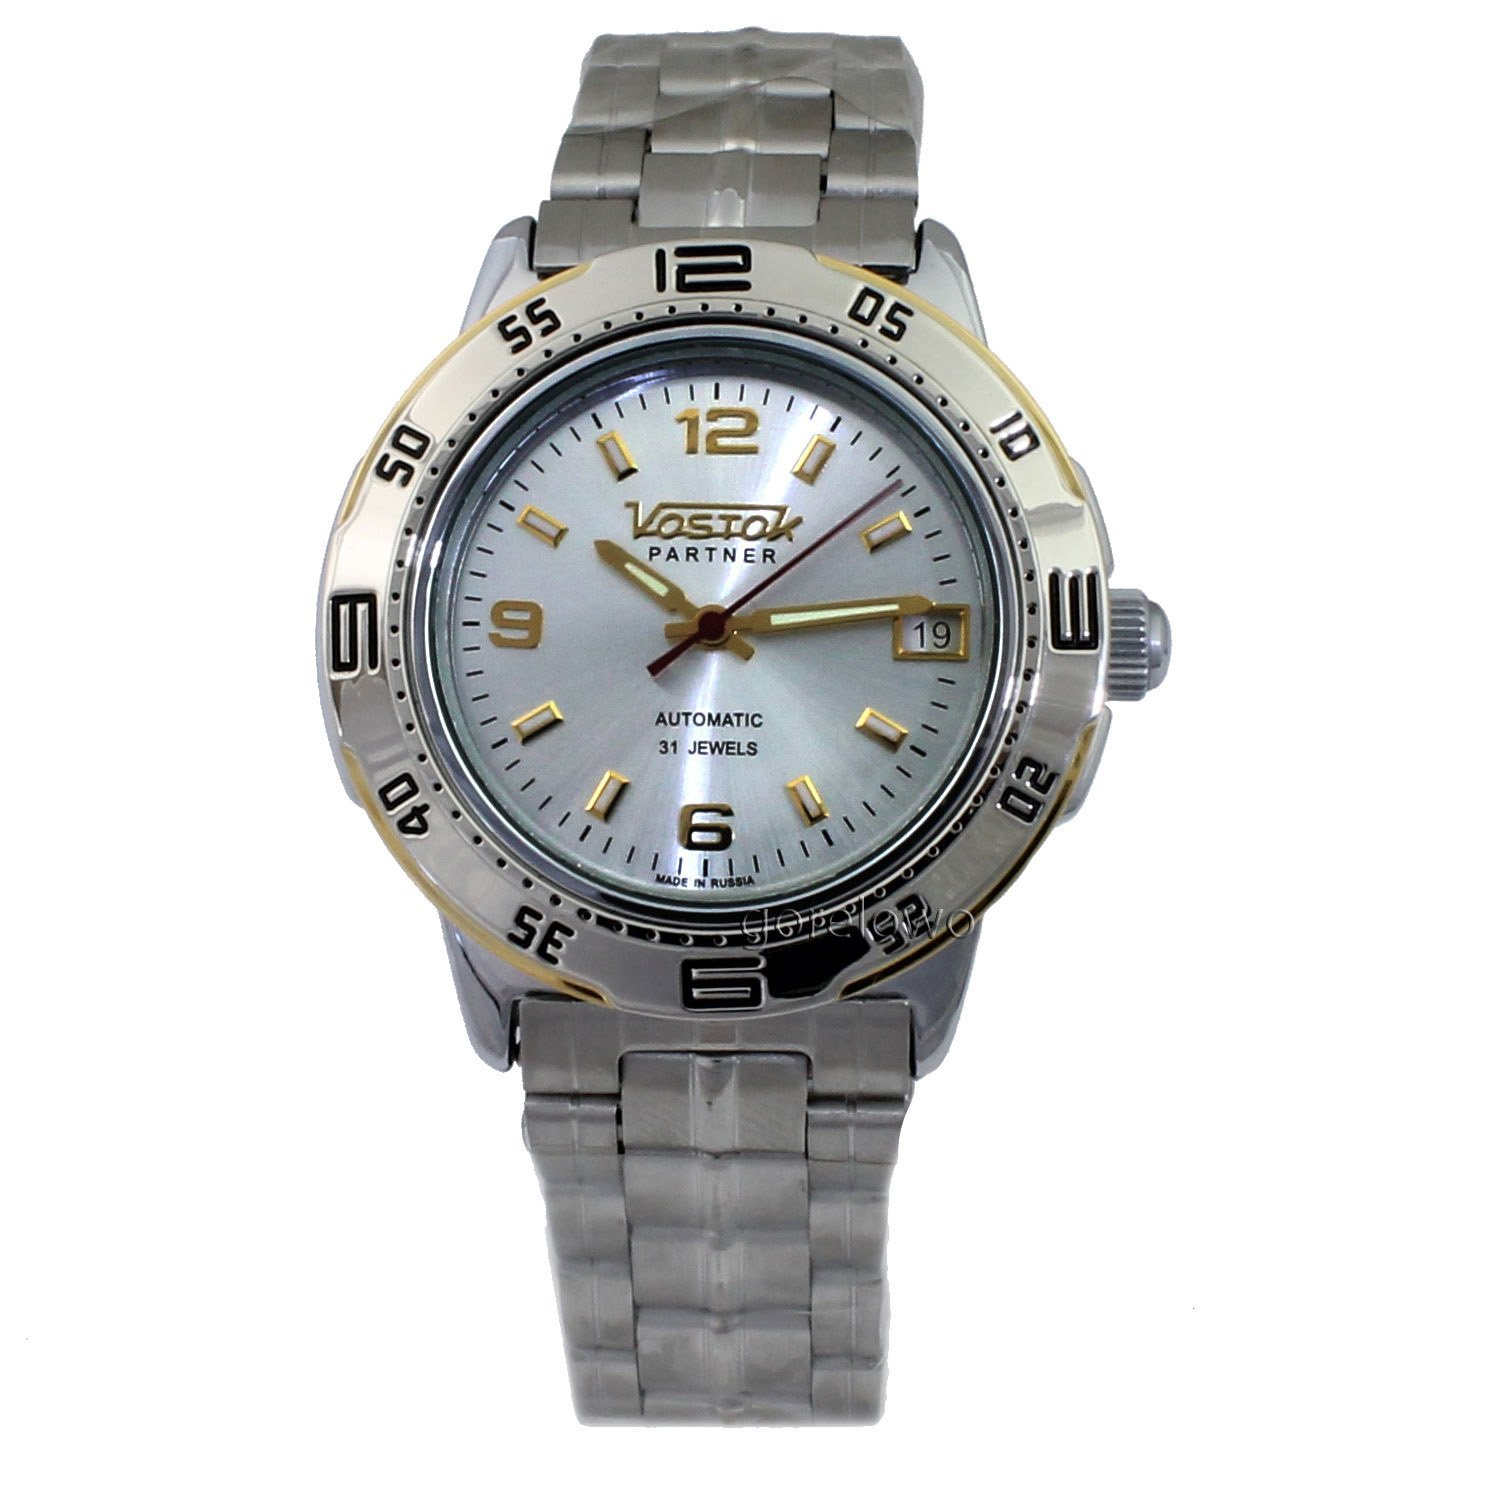 Vostok Partner 311191 / 2414b Mechanical Auto Wrist Watch Shockproof Waterpro...